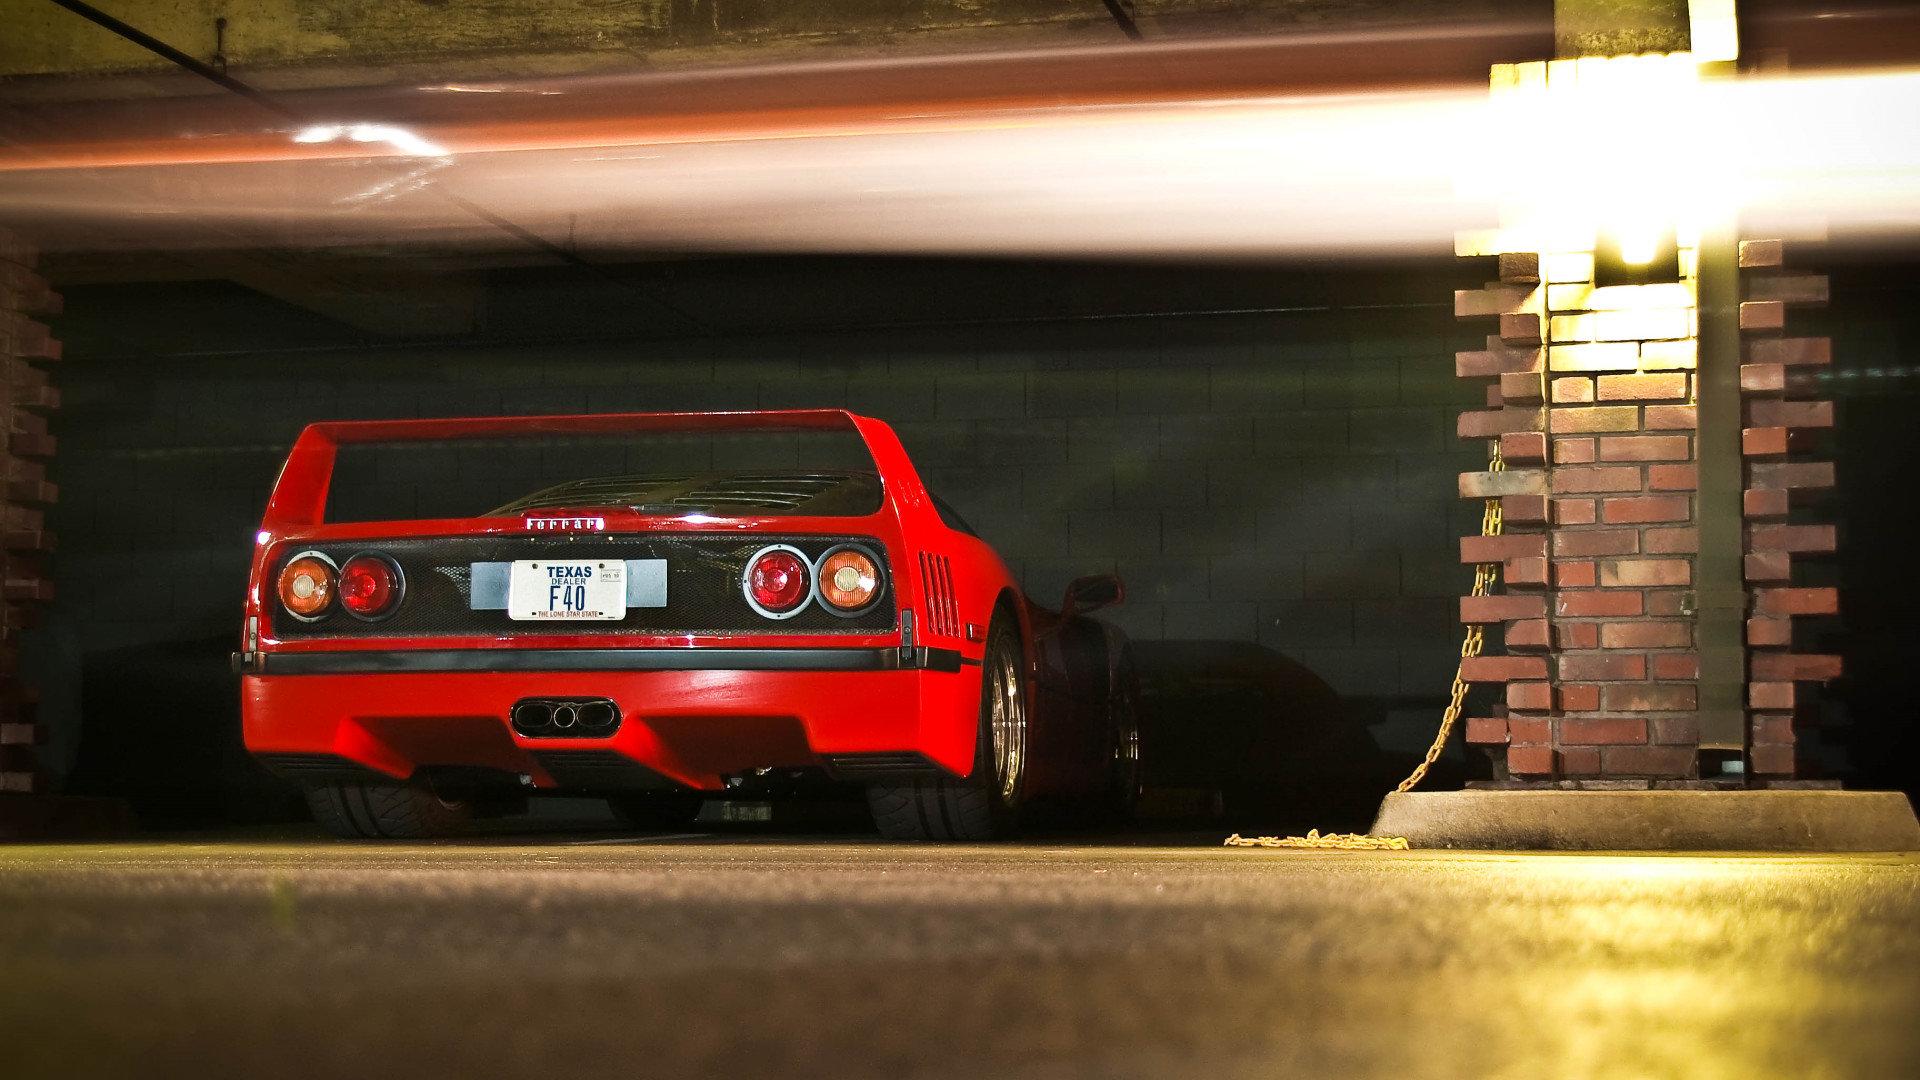 Ferrari F40 Wallpapers 1920x1080 Full Hd 1080p Desktop Backgrounds